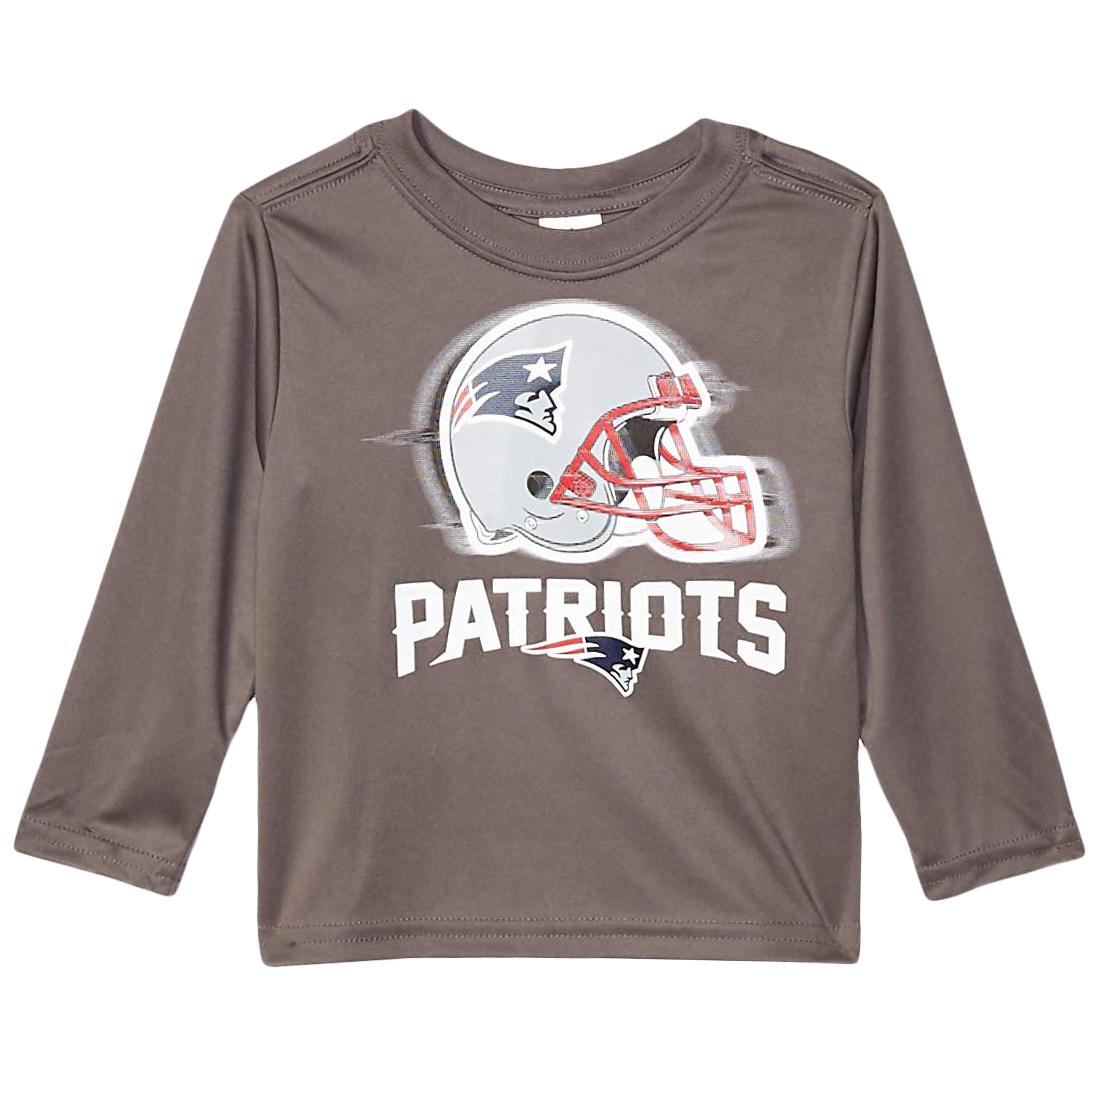 New England Patriots Toddler Boys' Gerber Long Sleeve Tee - Black, 2T